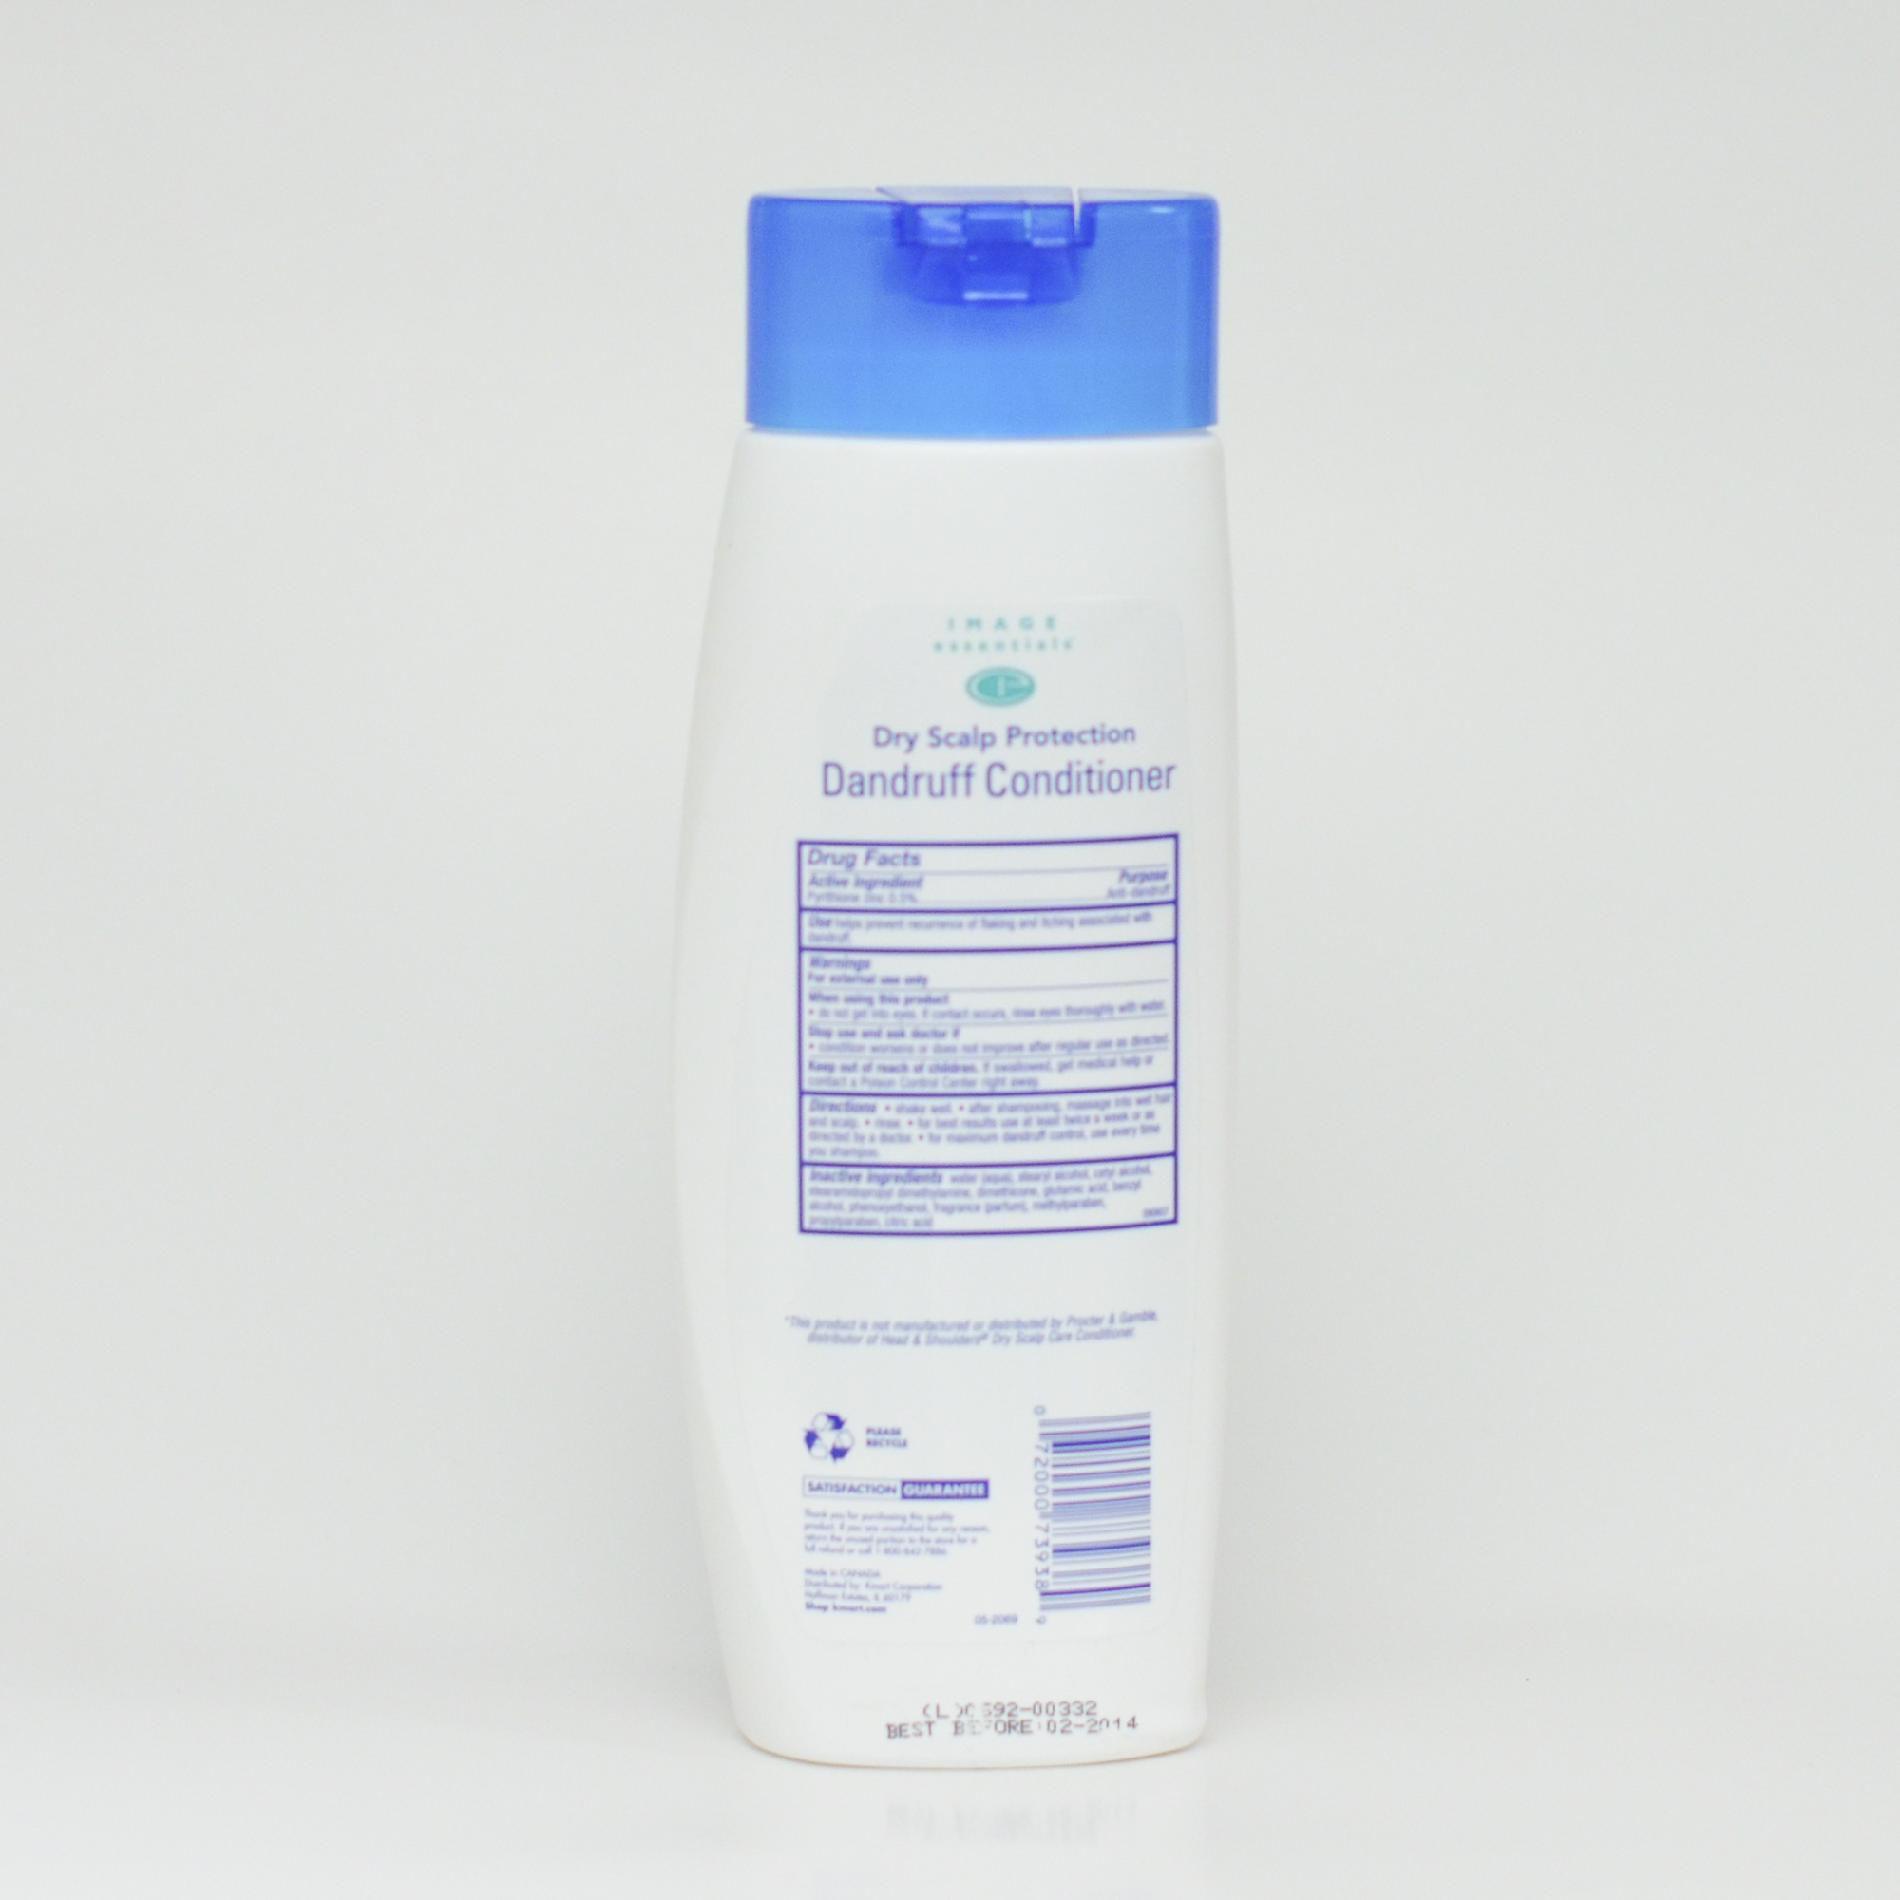 Image Essentials Dandruff Conditioner, Dry Scalp Protection, 13.5 fl oz (400 ml)